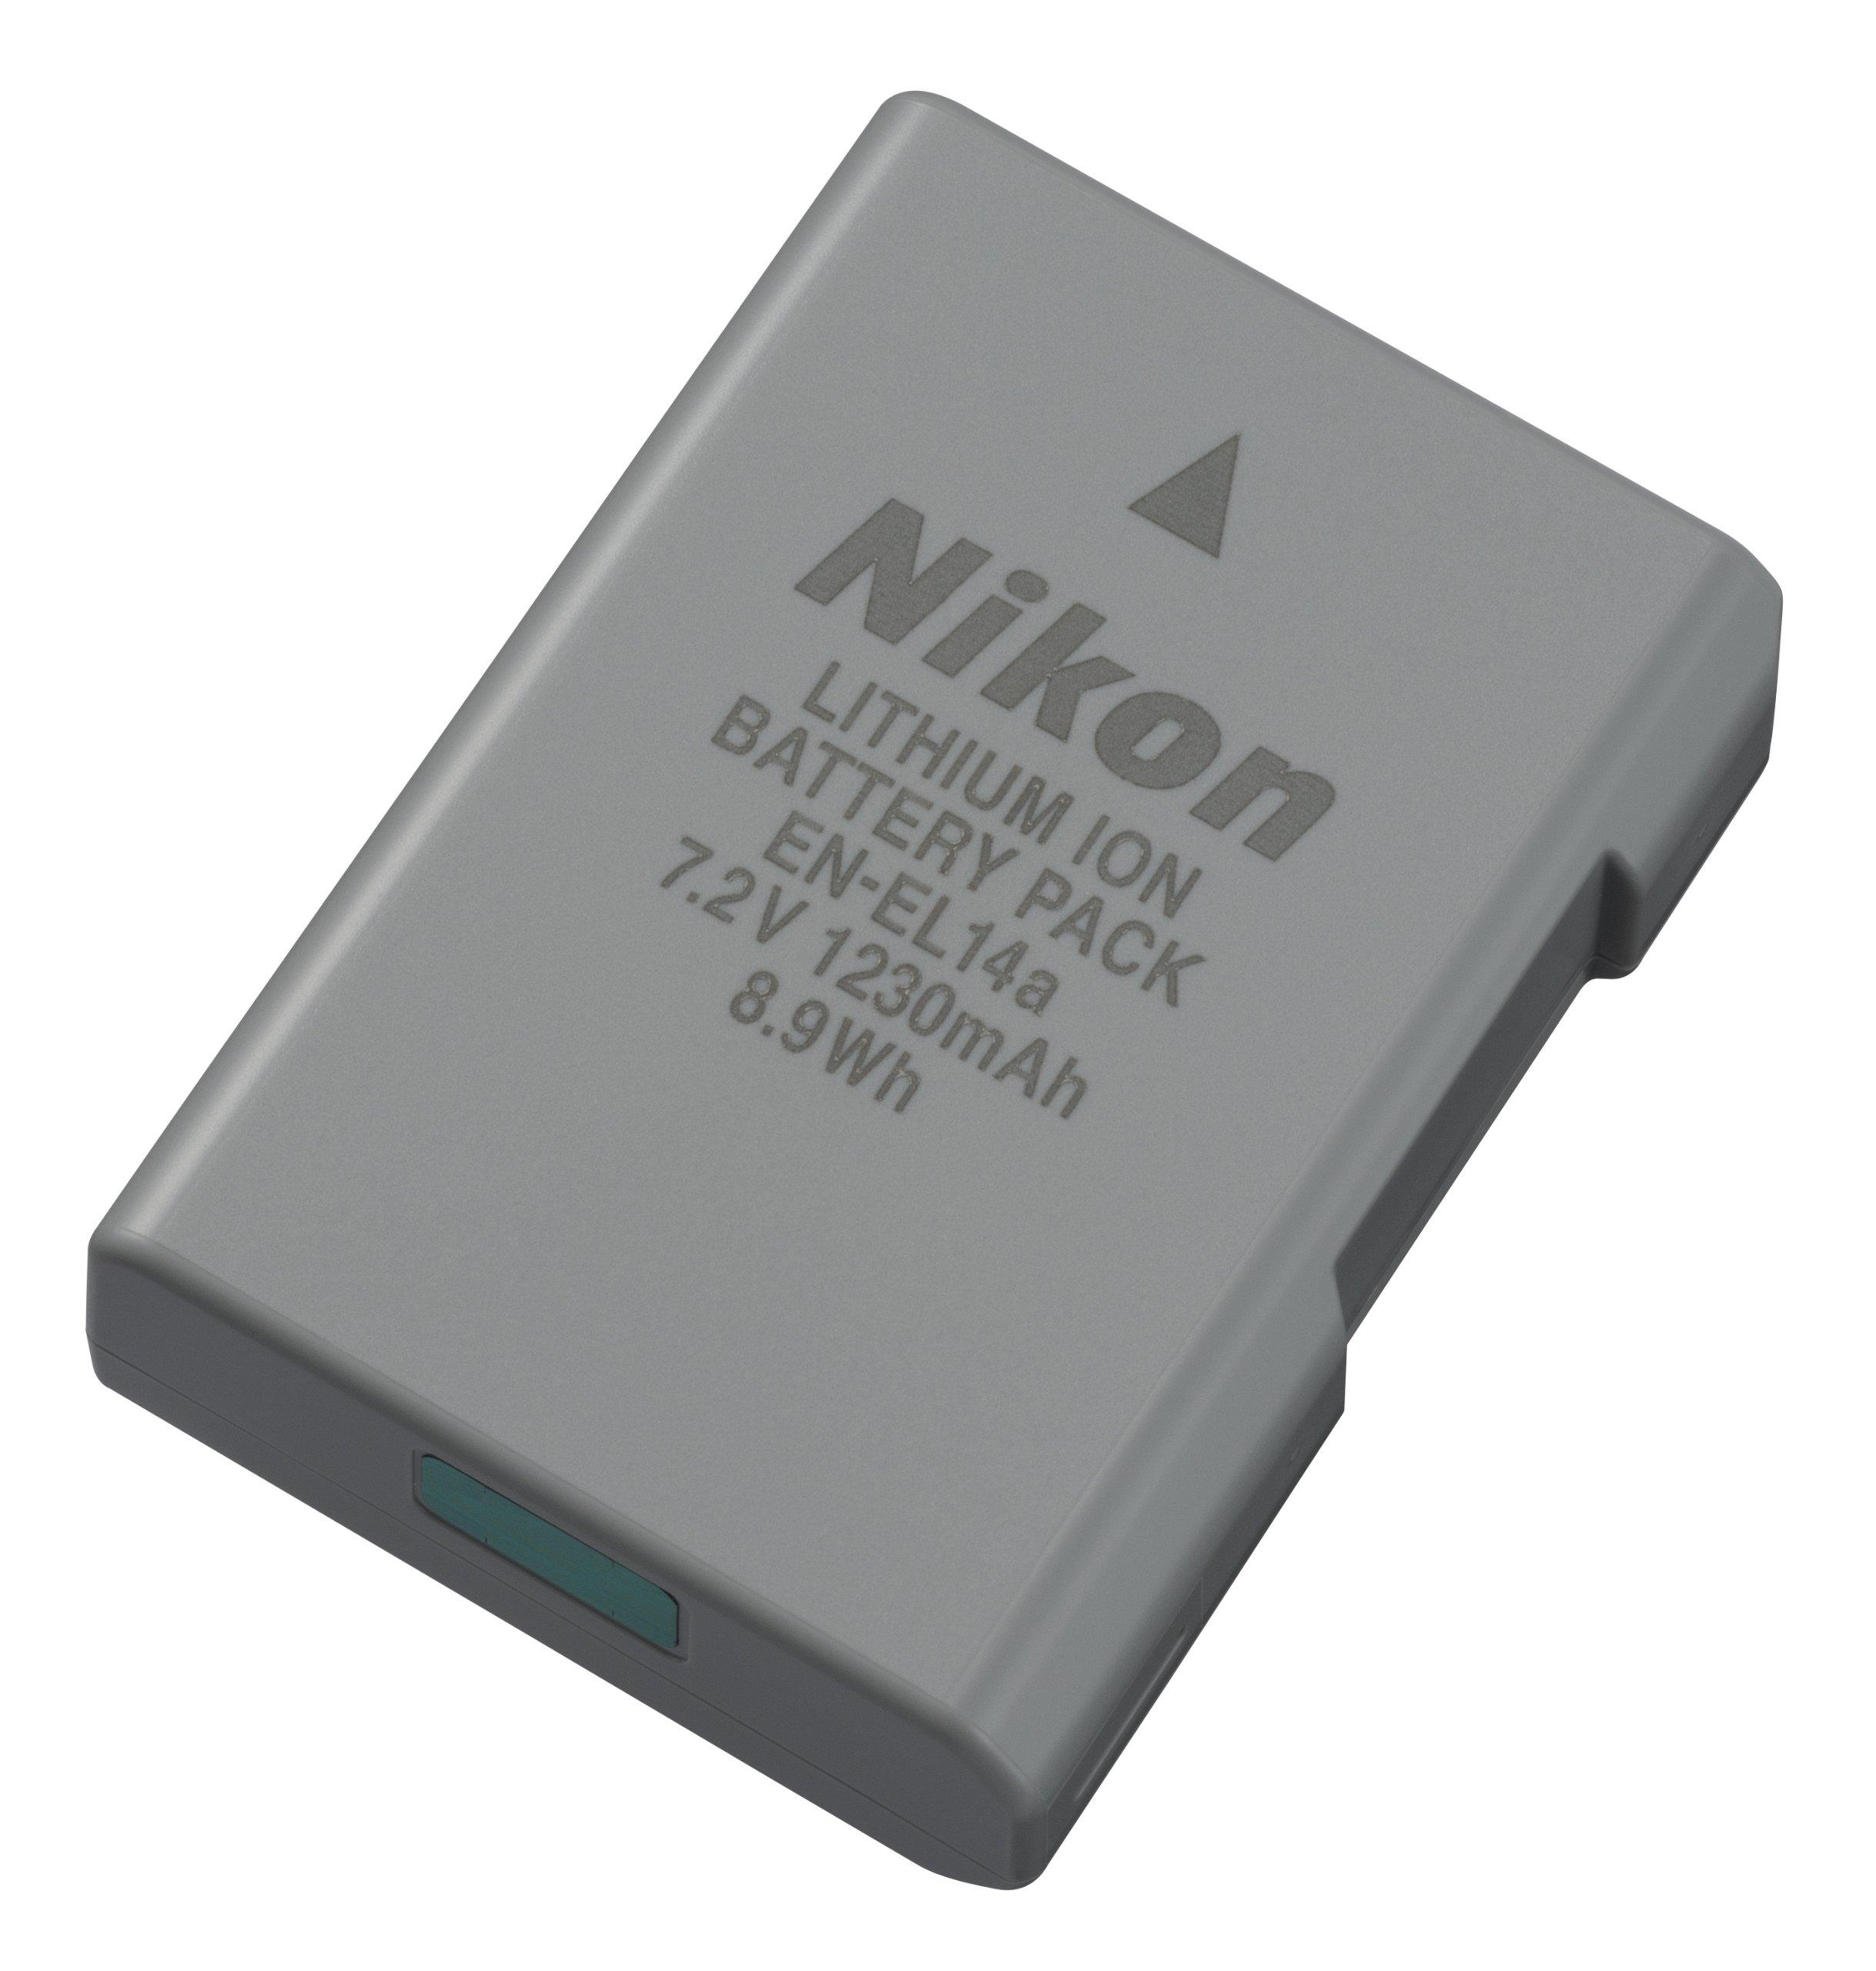 Nikon 27126 EN-EL 14A Rechargeable Li-Ion Battery (Grey) by Nikon